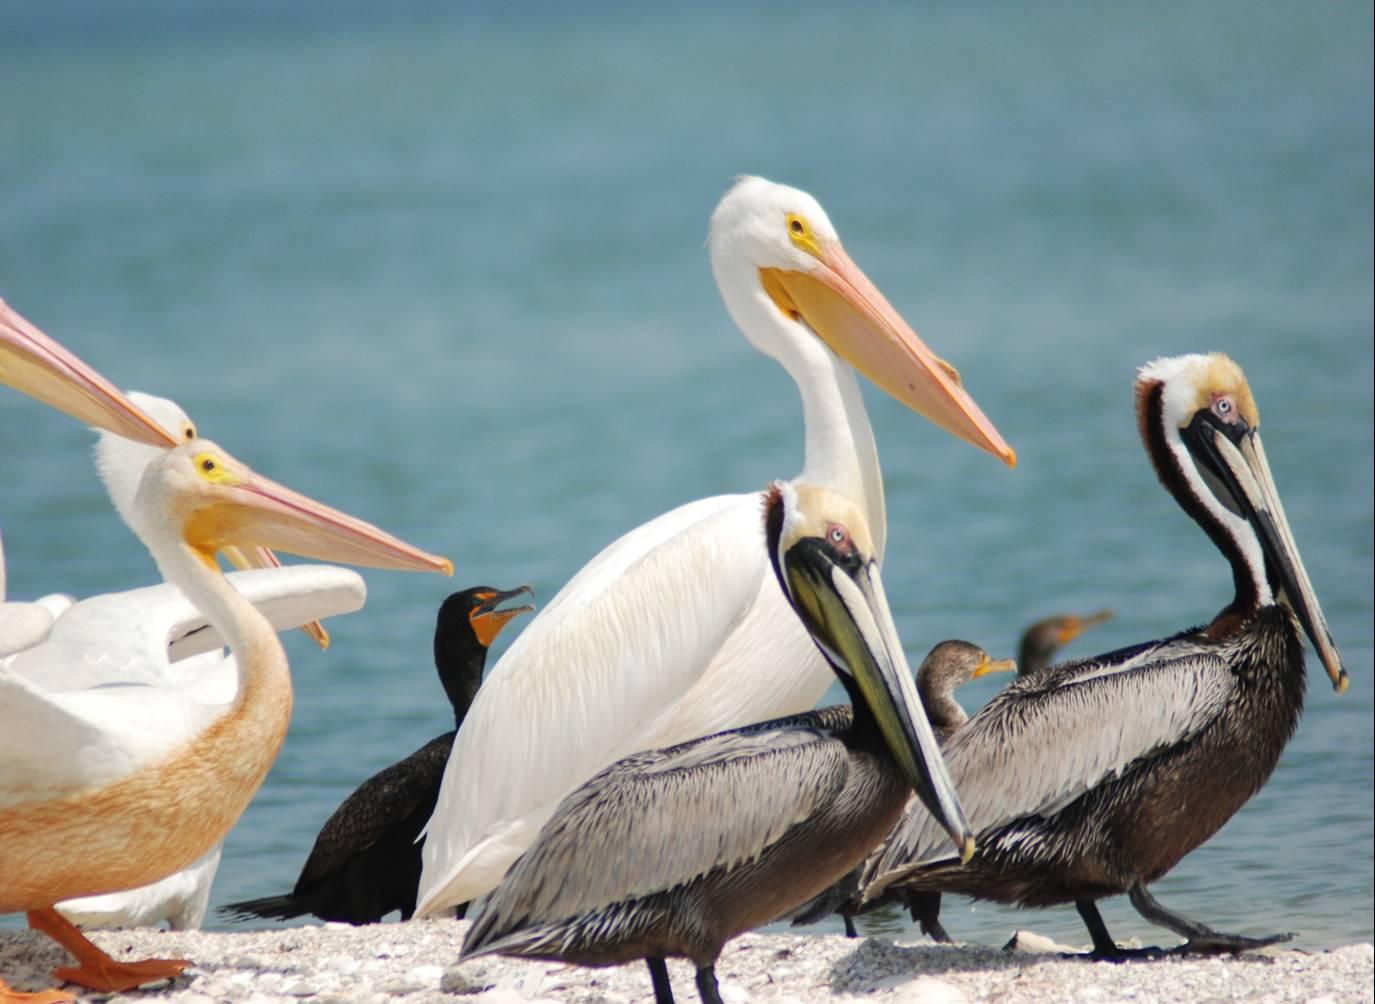 Brown and White Pelicans with Double-crested Cormorants at Gasparillo Sound-Charlotte Harbor Aquatic Preserve